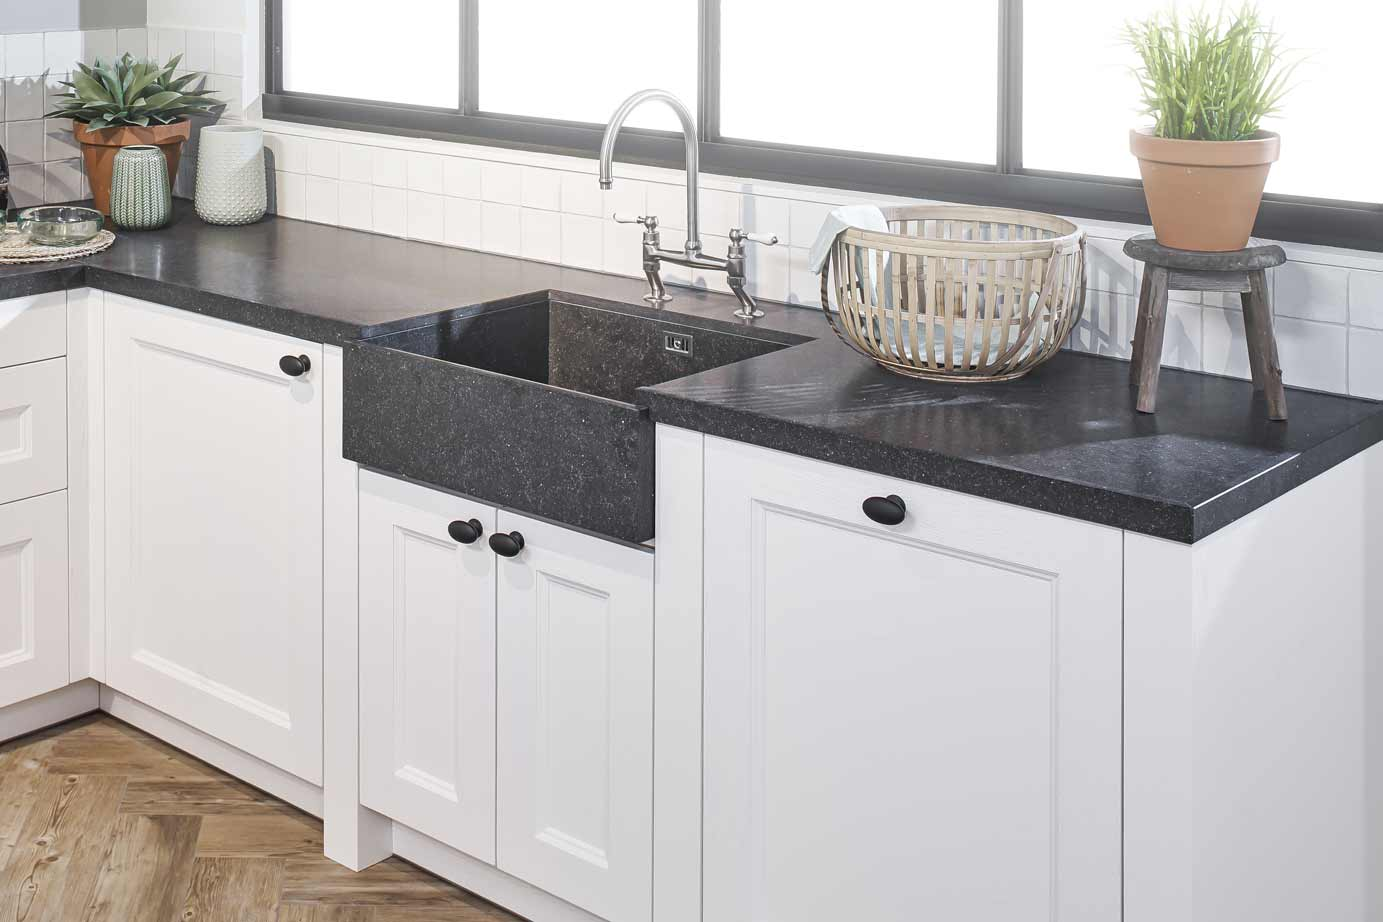 Witte Wasbak Keuken : Witte keuken spoelbak over italiaanse design keukens witte